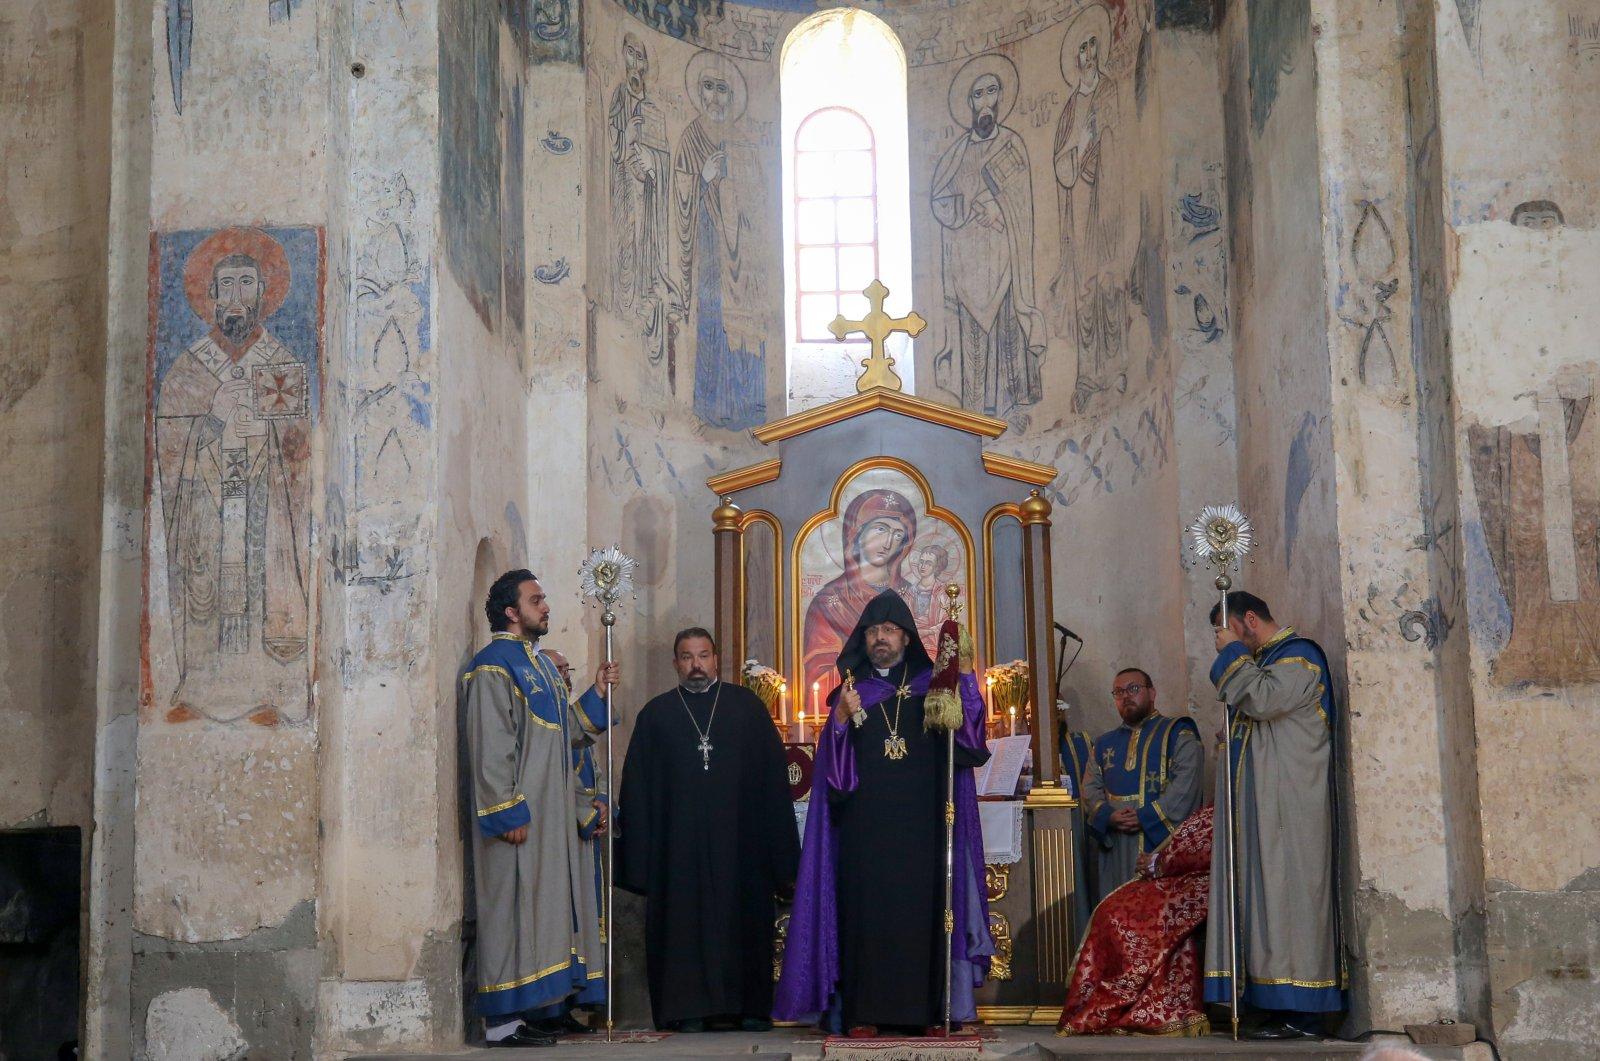 Armenian Orthodox Patriarch Sahak Maşalyan conducts the annual service at Akdamar Church in Van, Turkey, Sept. 6, 2020. (AA Photo)